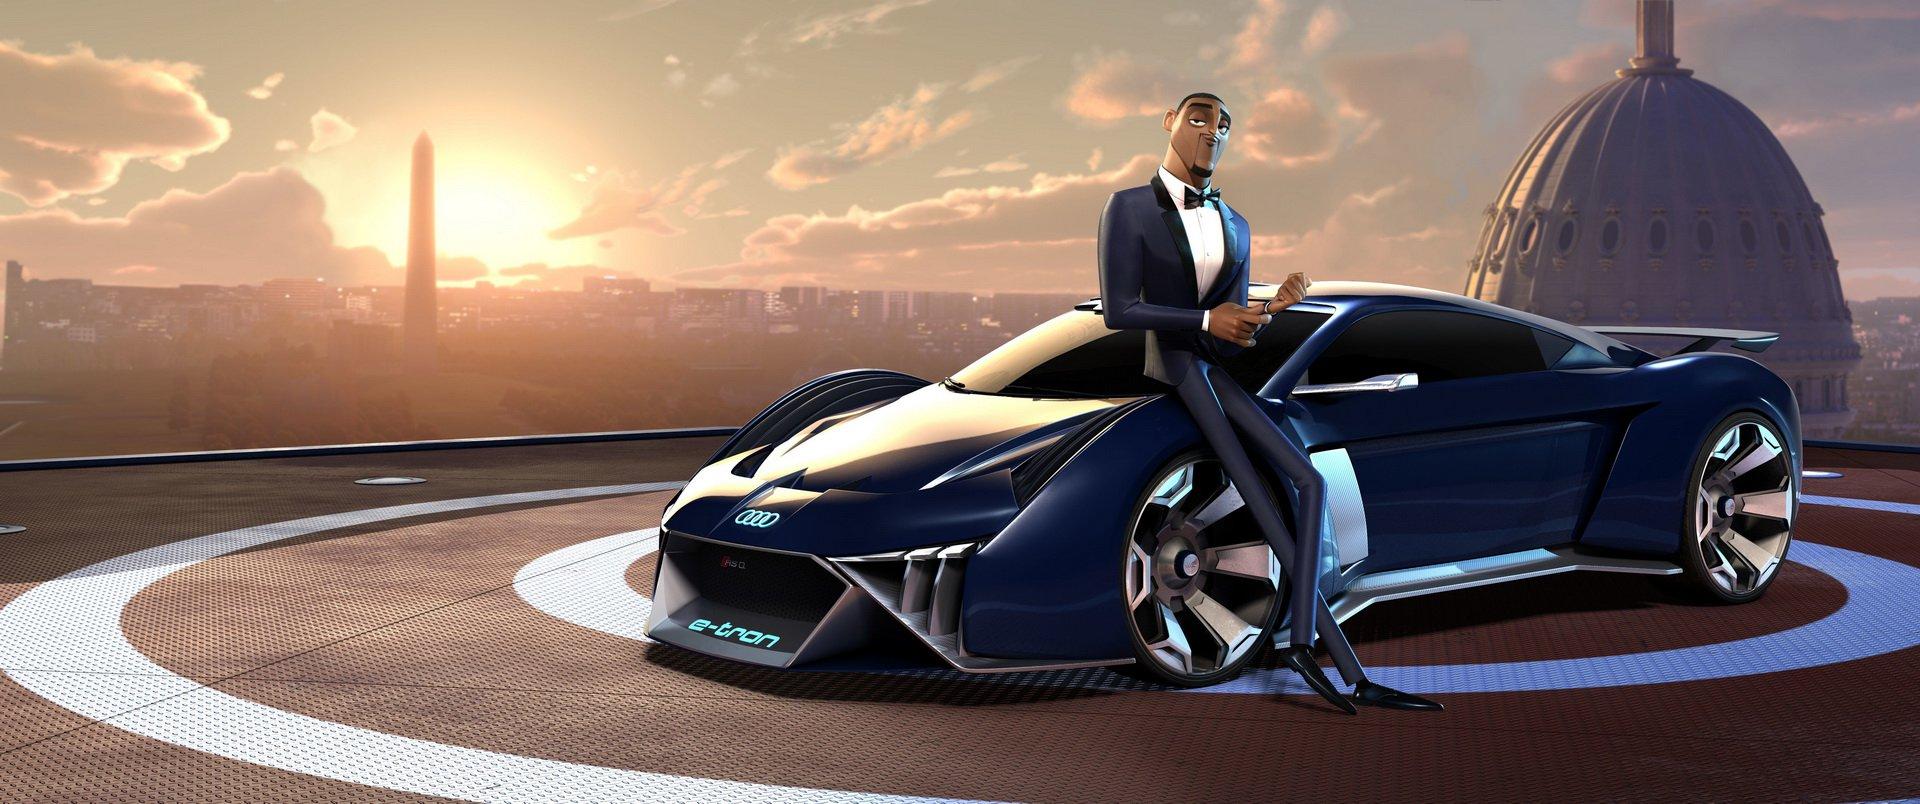 b8e1b53c-audi-concept-car-animated-film-1